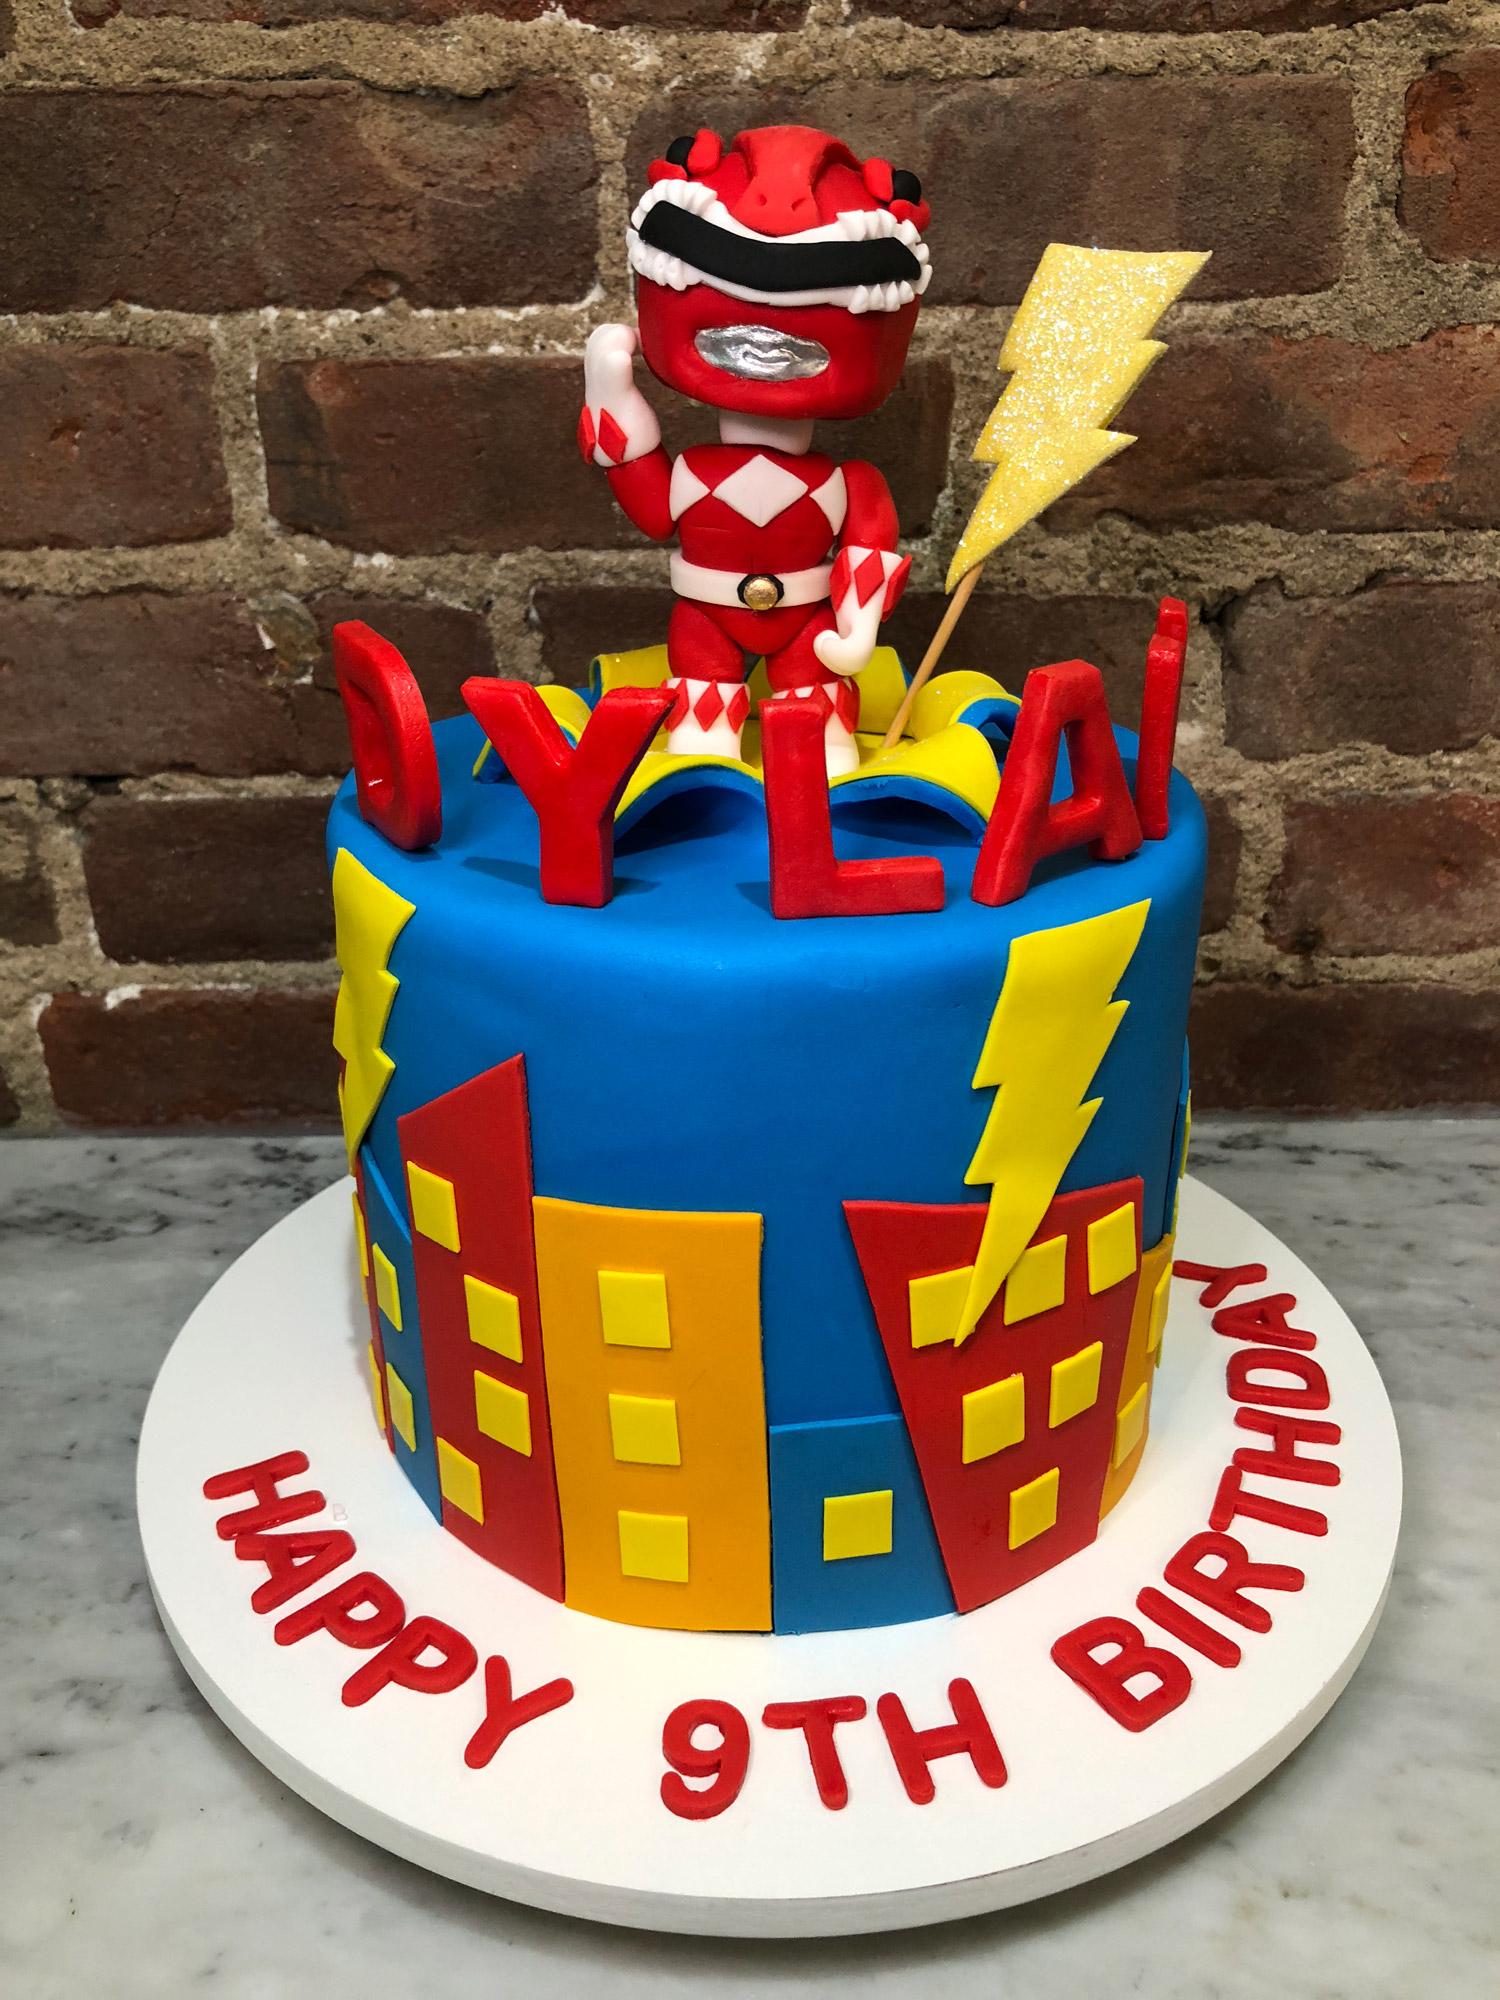 Astonishing Sugarpaste Power Ranger Cake Huascar Co Funny Birthday Cards Online Barepcheapnameinfo